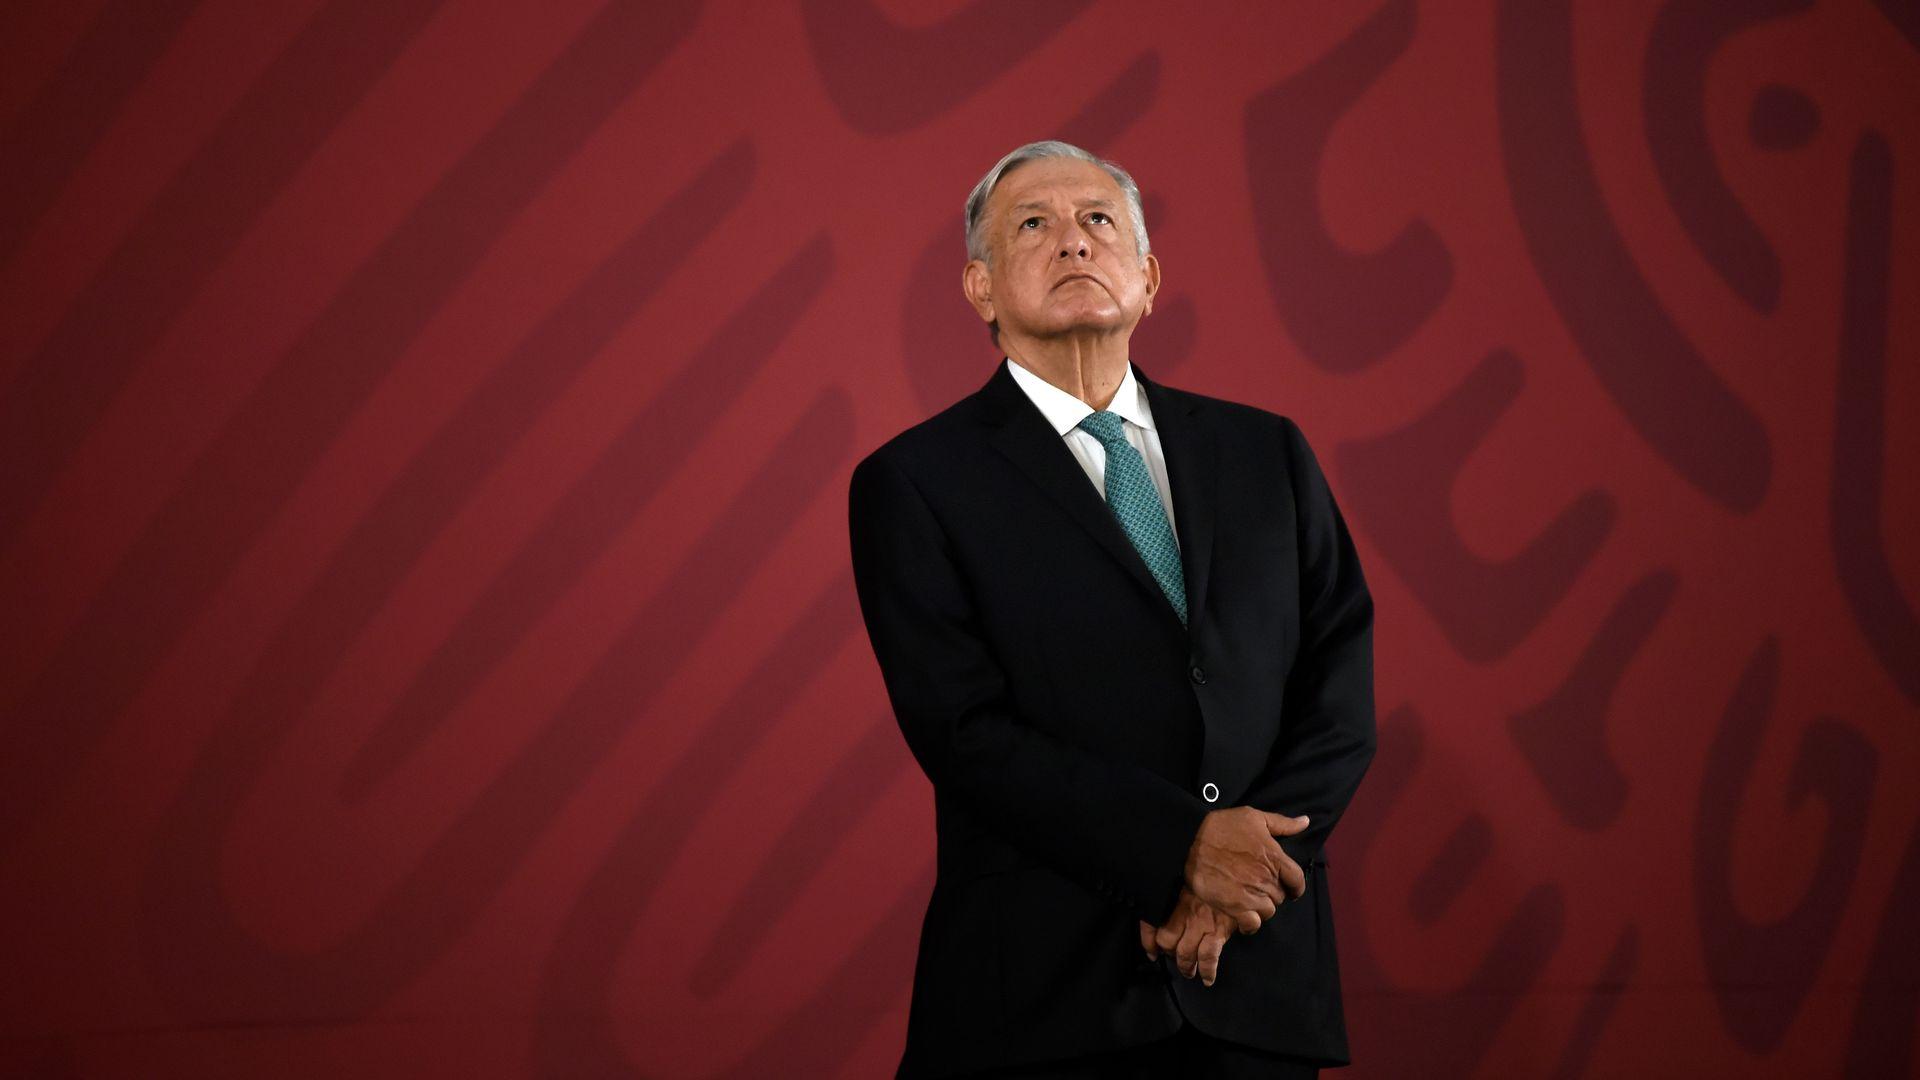 Top negotiator accuses U.S. of blindsiding Mexico with USMCA labor provision